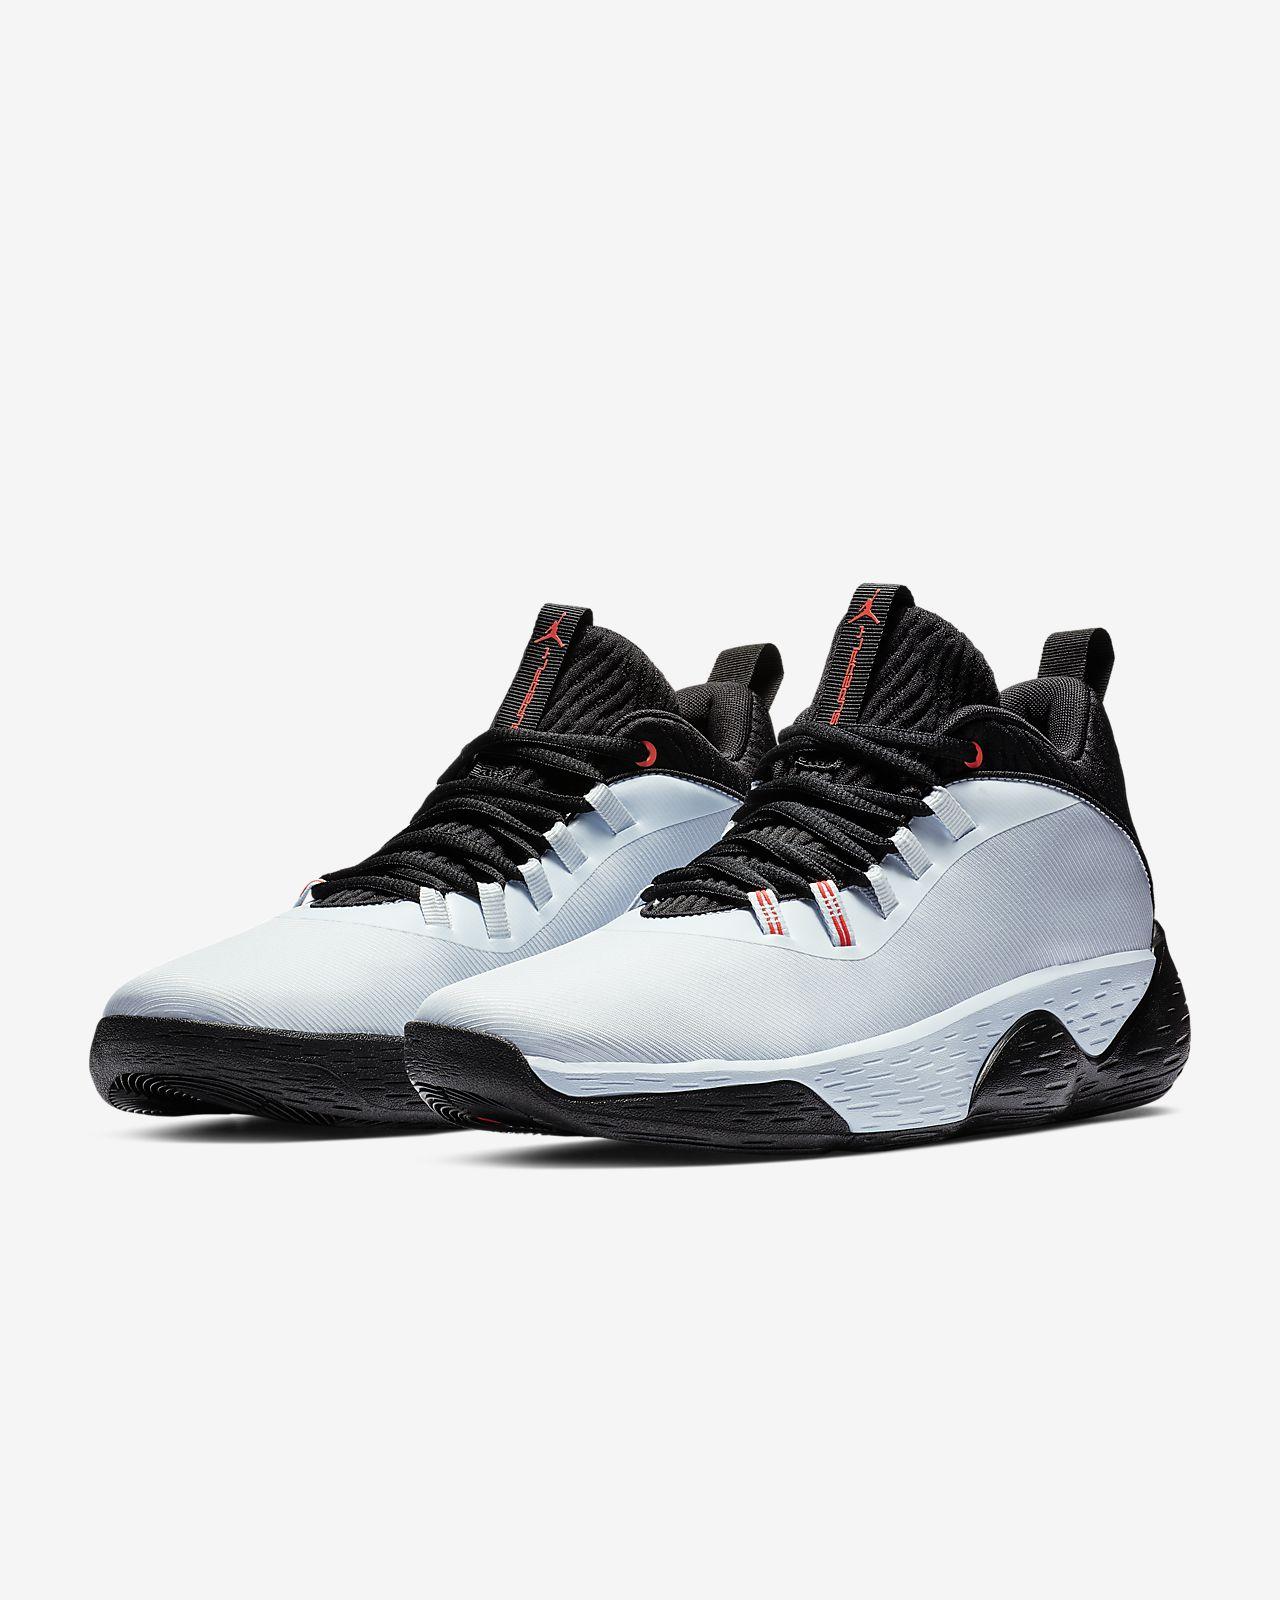 Fly MVP Low Men s Basketball Shoe Jordan Super.Fly MVP Low Men s Basketball  Shoe 01983a6c0